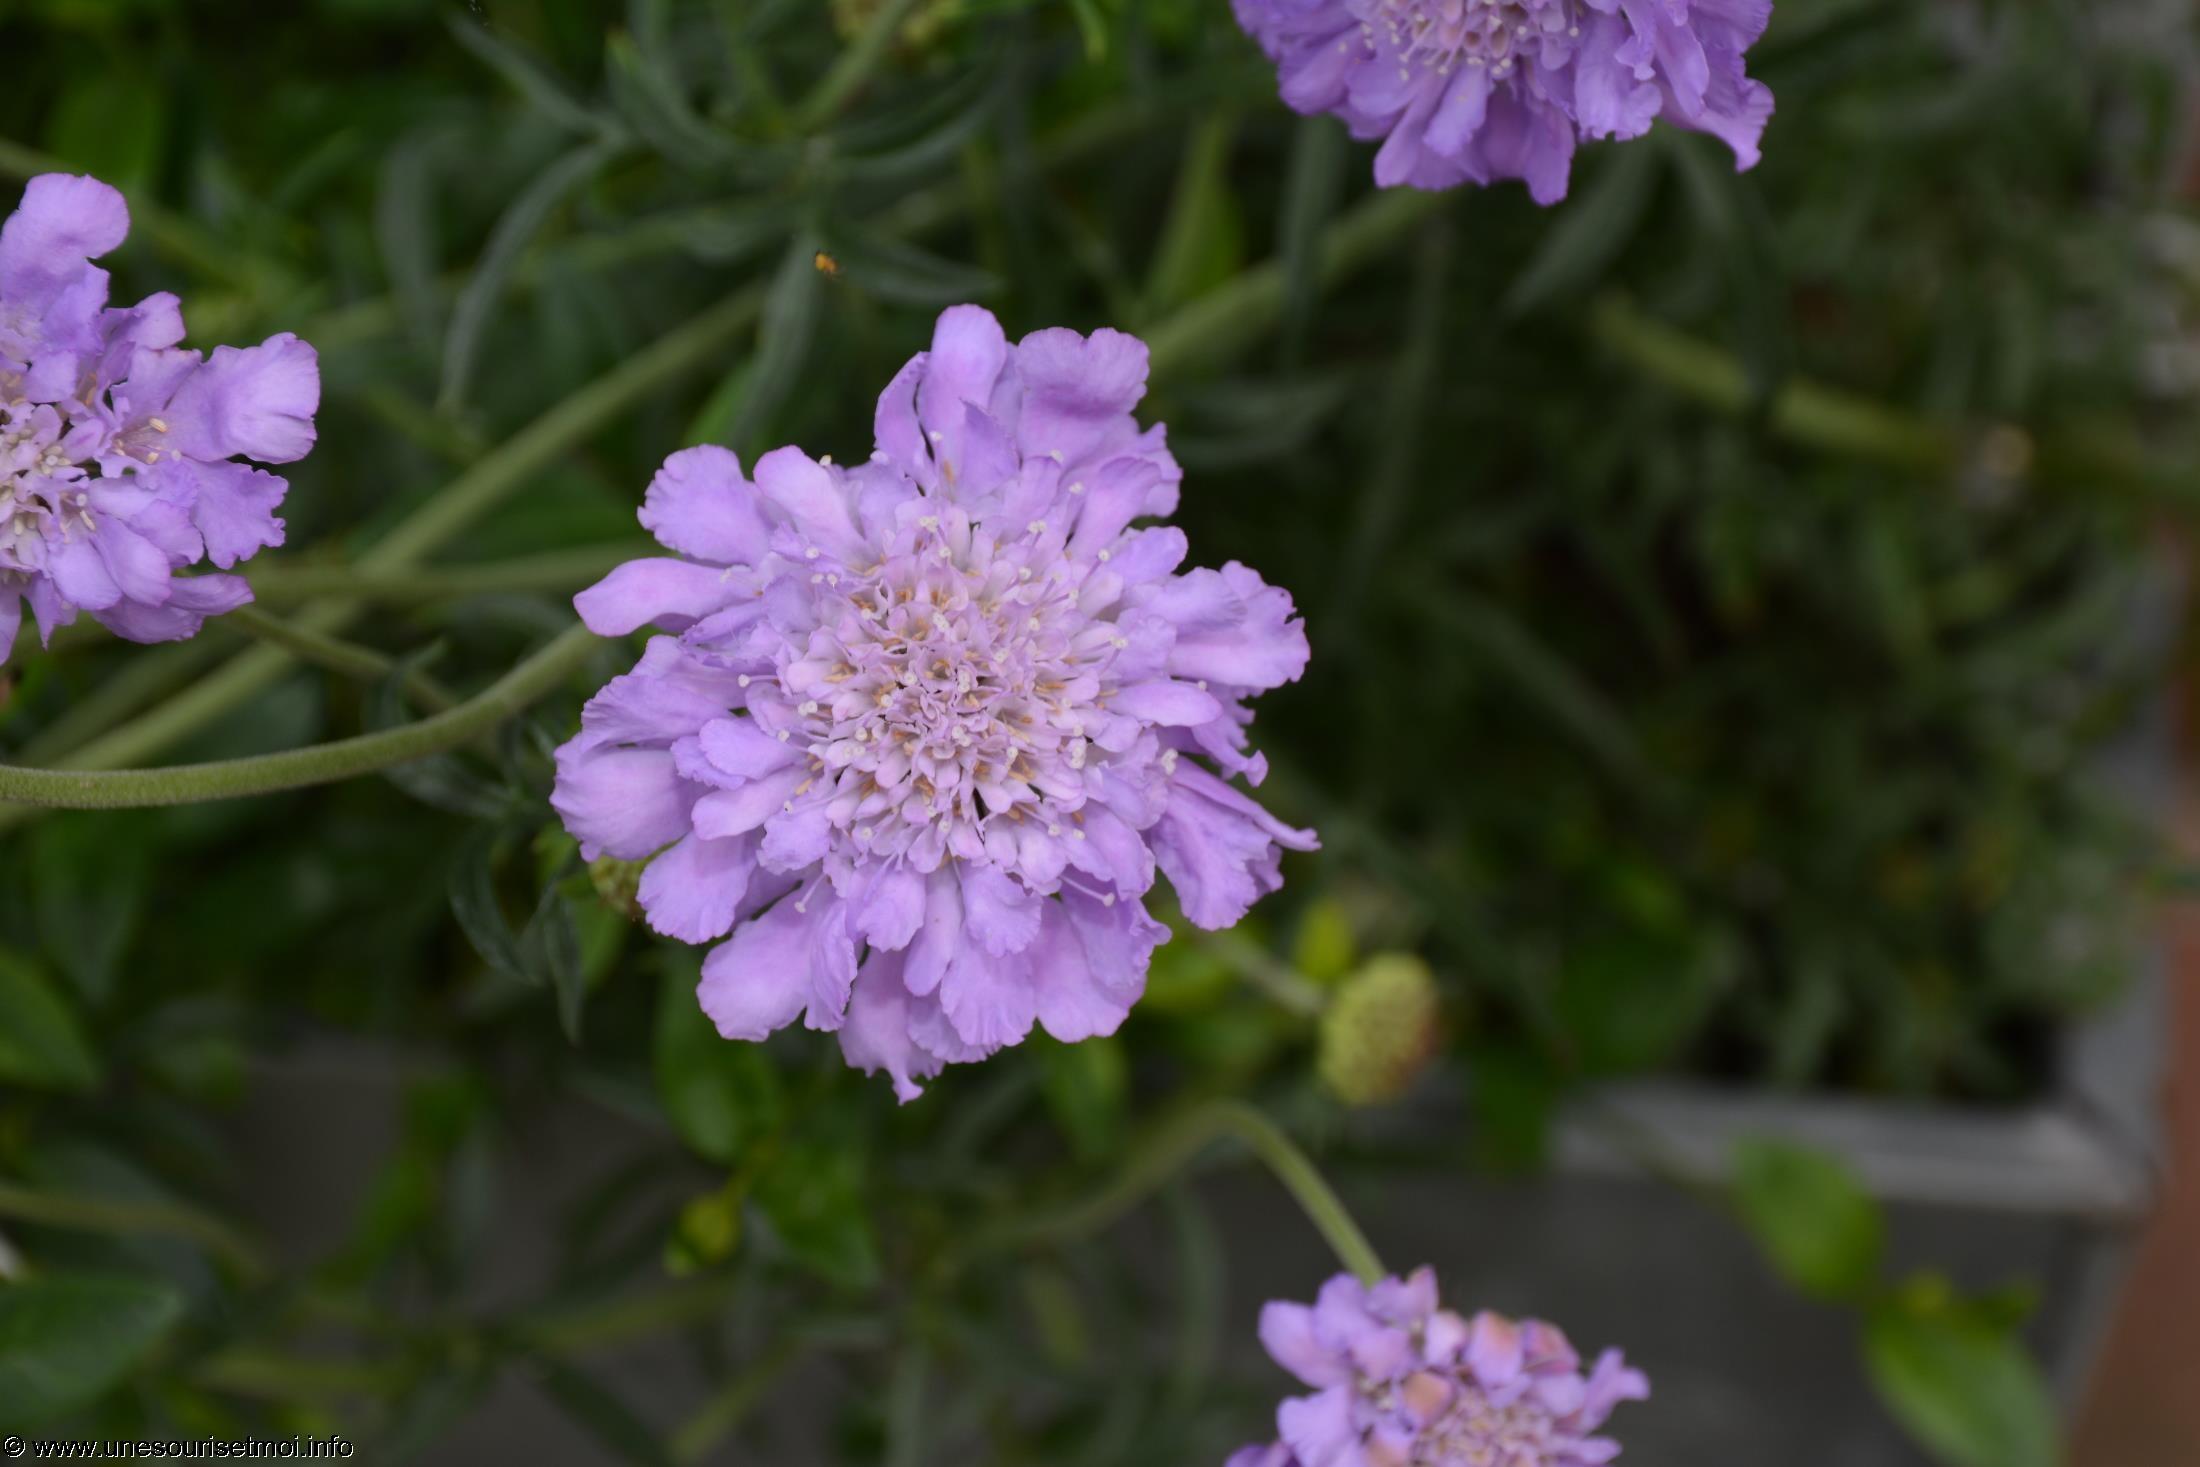 fleurs-ete-printemps-du-jardin-en-grand-format-HD_3